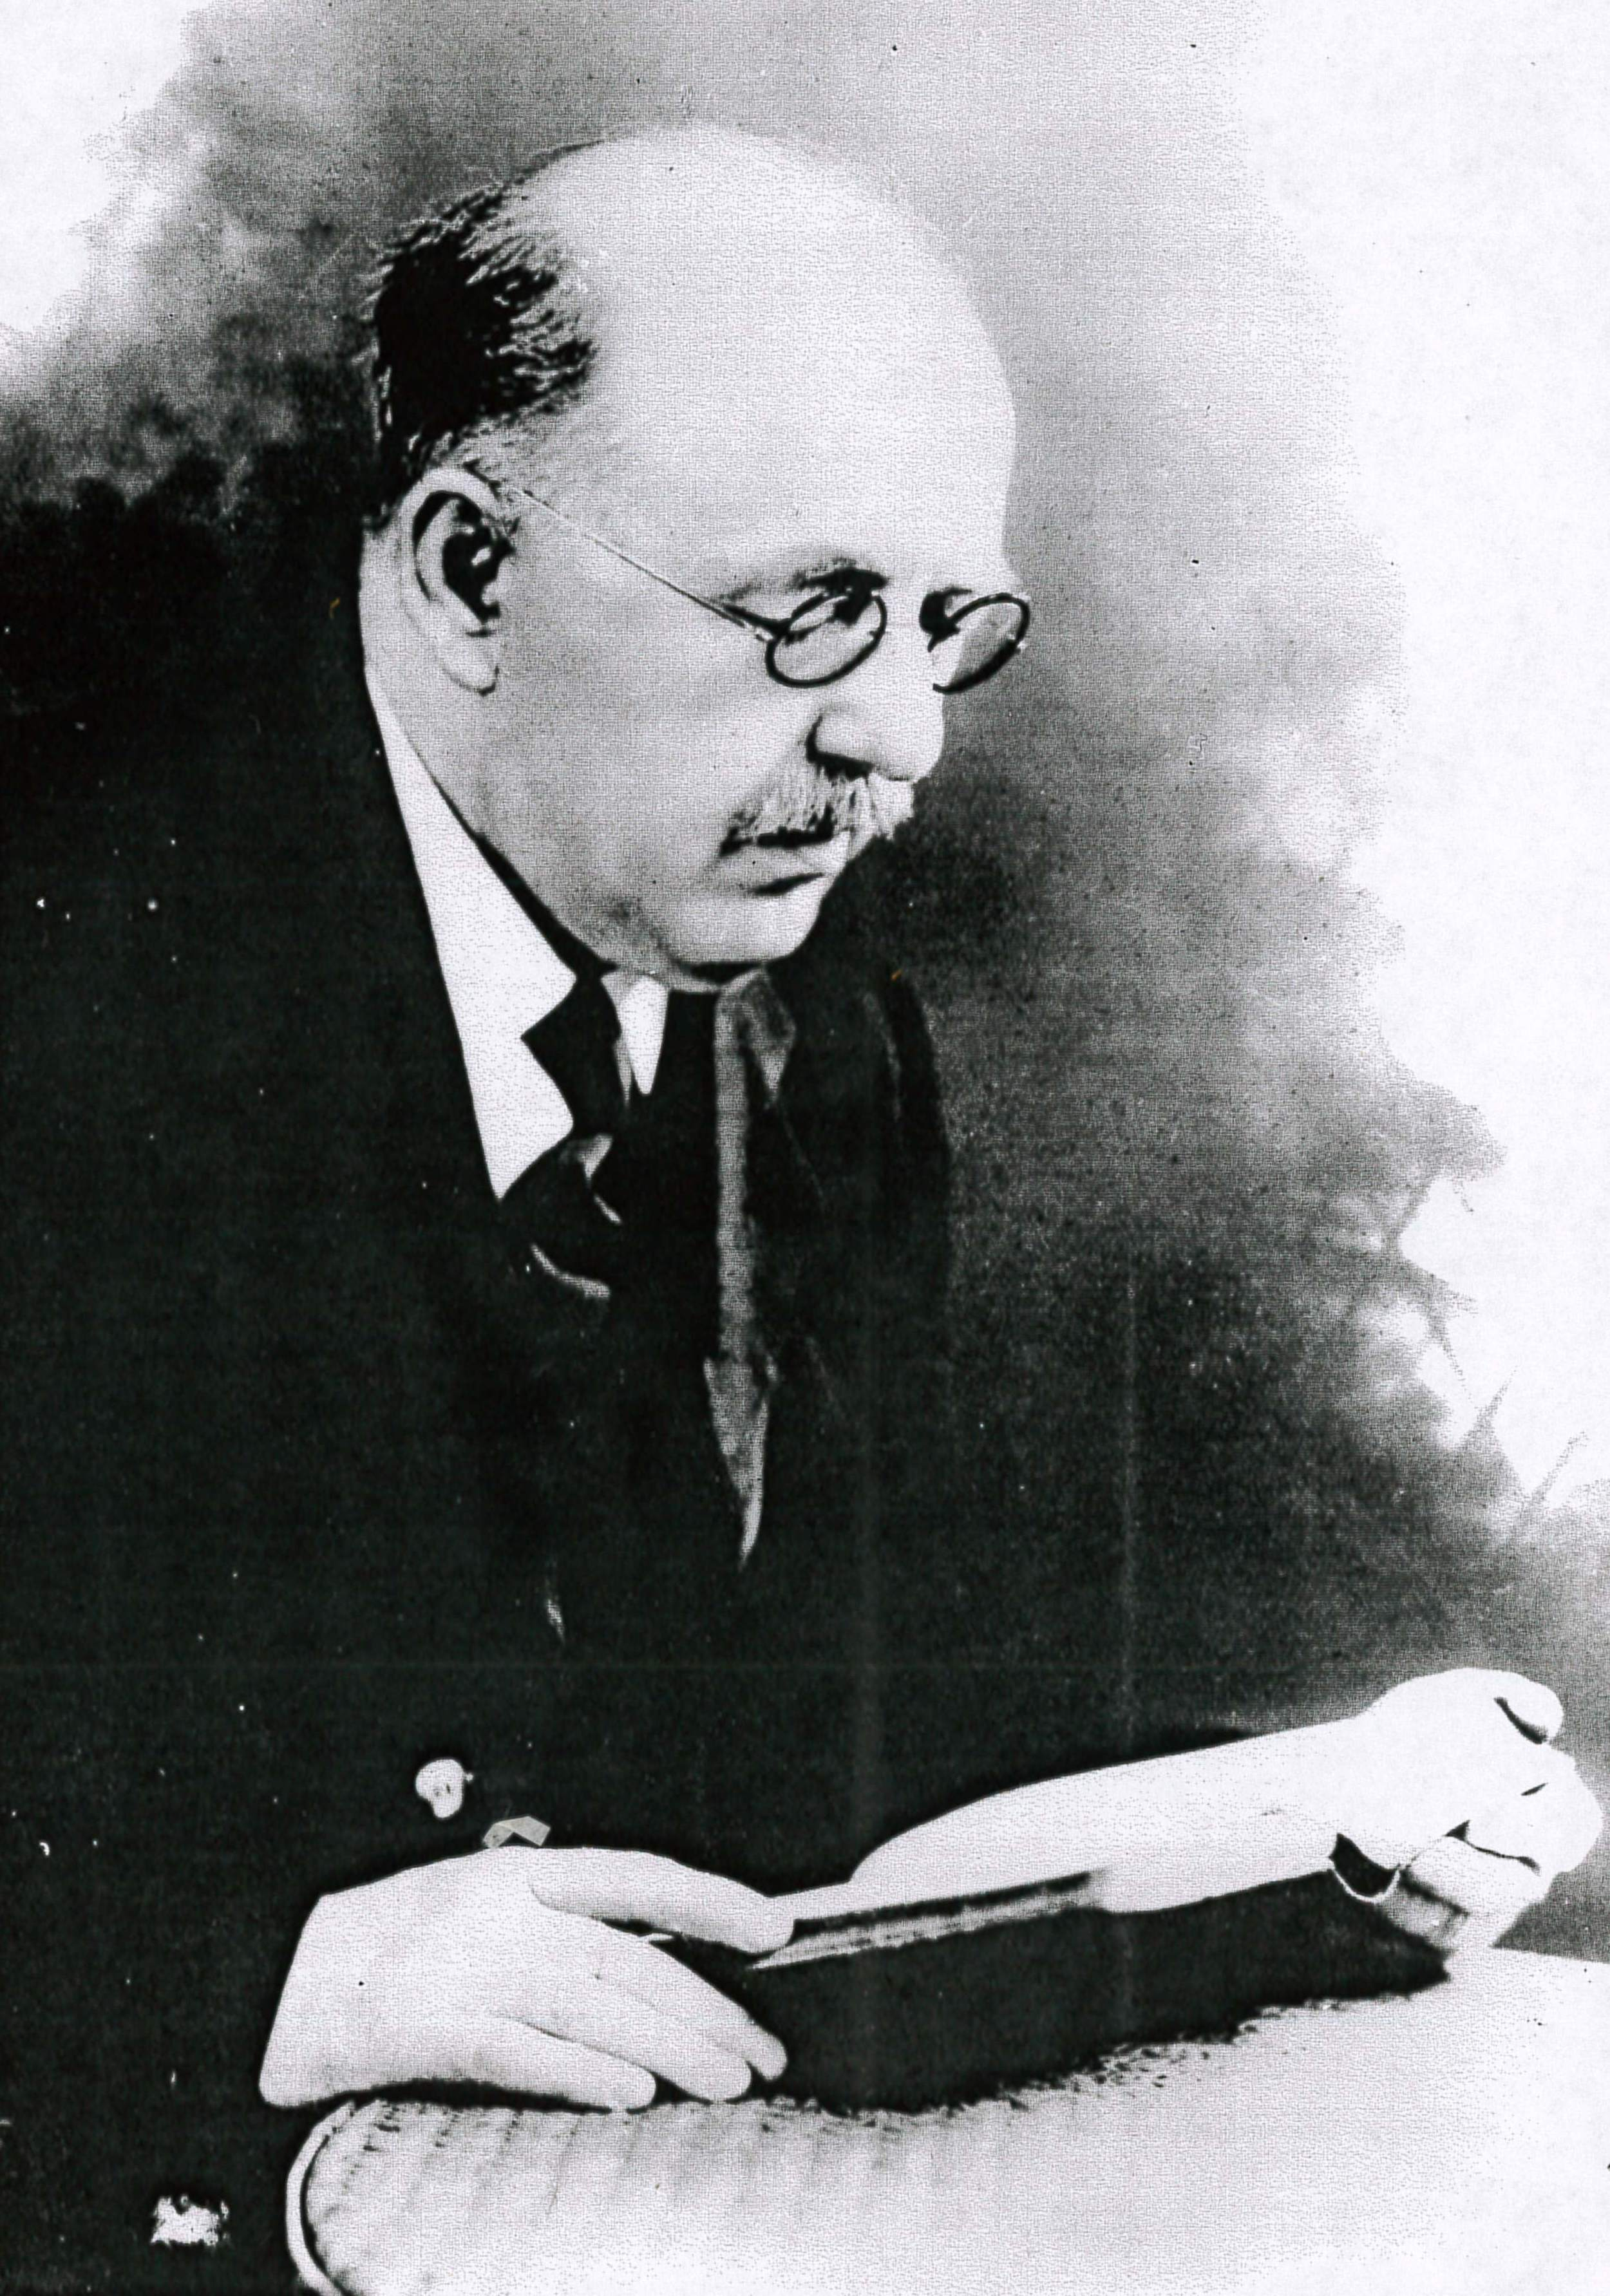 Rev. Henry Rehn